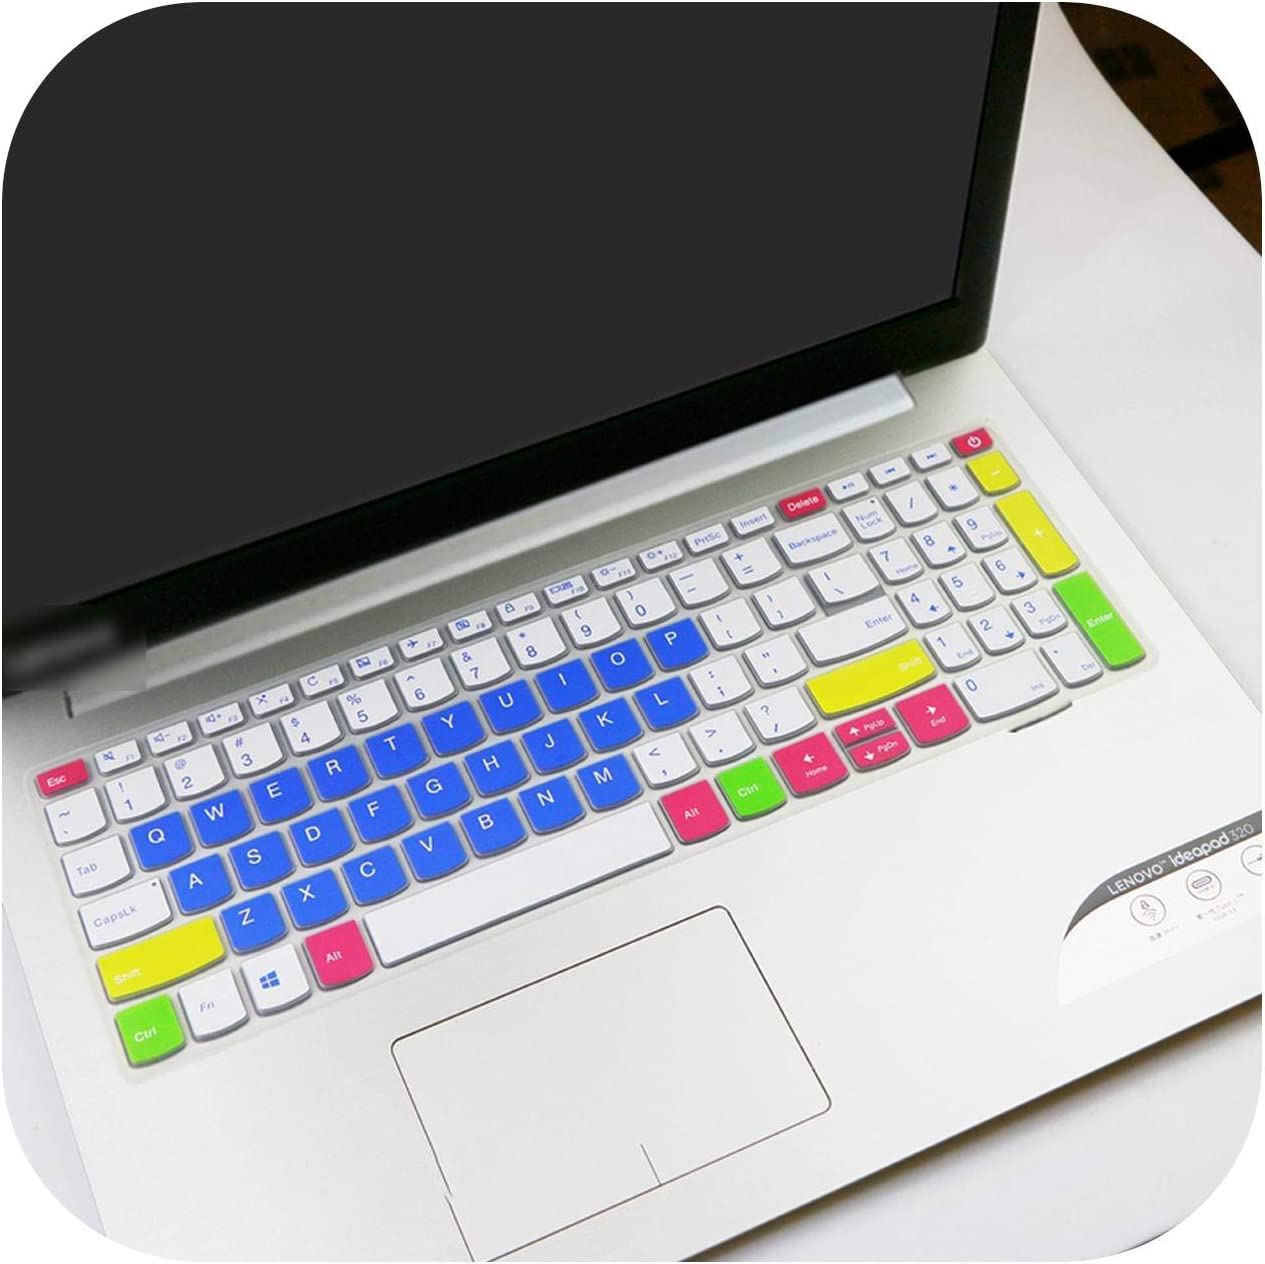 Laptop Keyboard Cover Skin Protector for Lenovo ideapad 320 17 V320 330 17 330-17 330-17ikb 320-17IKBR V320-17IKB 17.3 inch-candyblue-